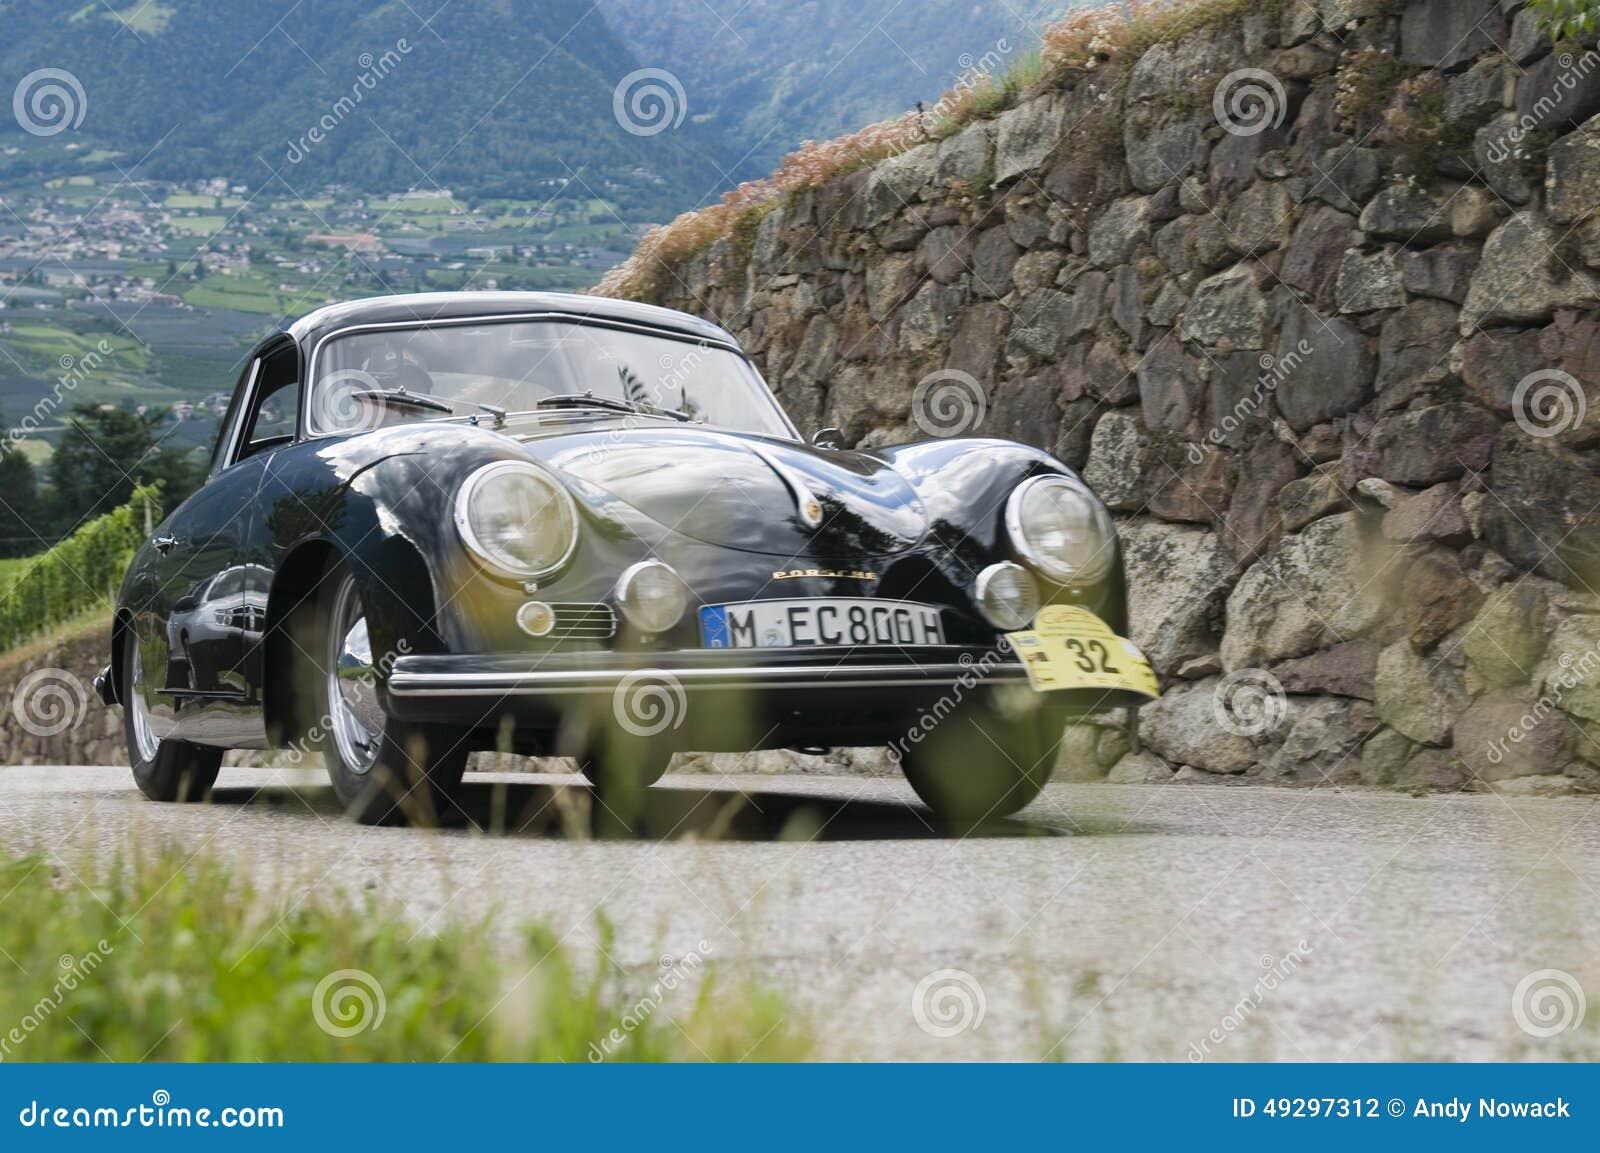 South tyrol classic cars_2014_Porsche 356_2